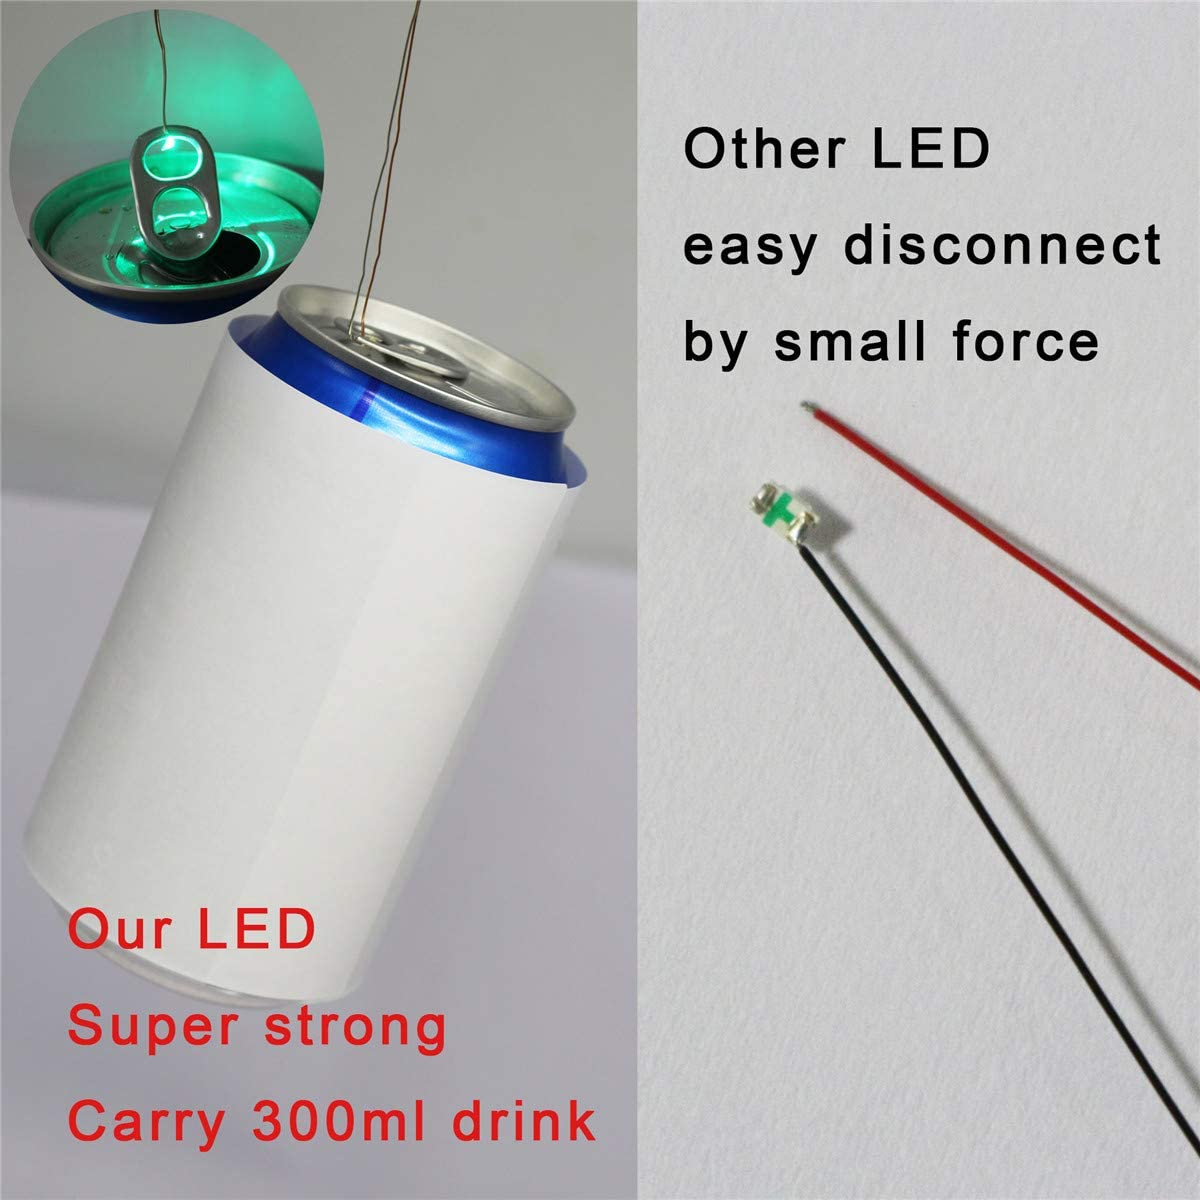 Bowerful 25 pcs Pre-soldered Rainbow RGB Flashing SMD Led 0605 Muti-Resistor Micro Litz Wired Leads